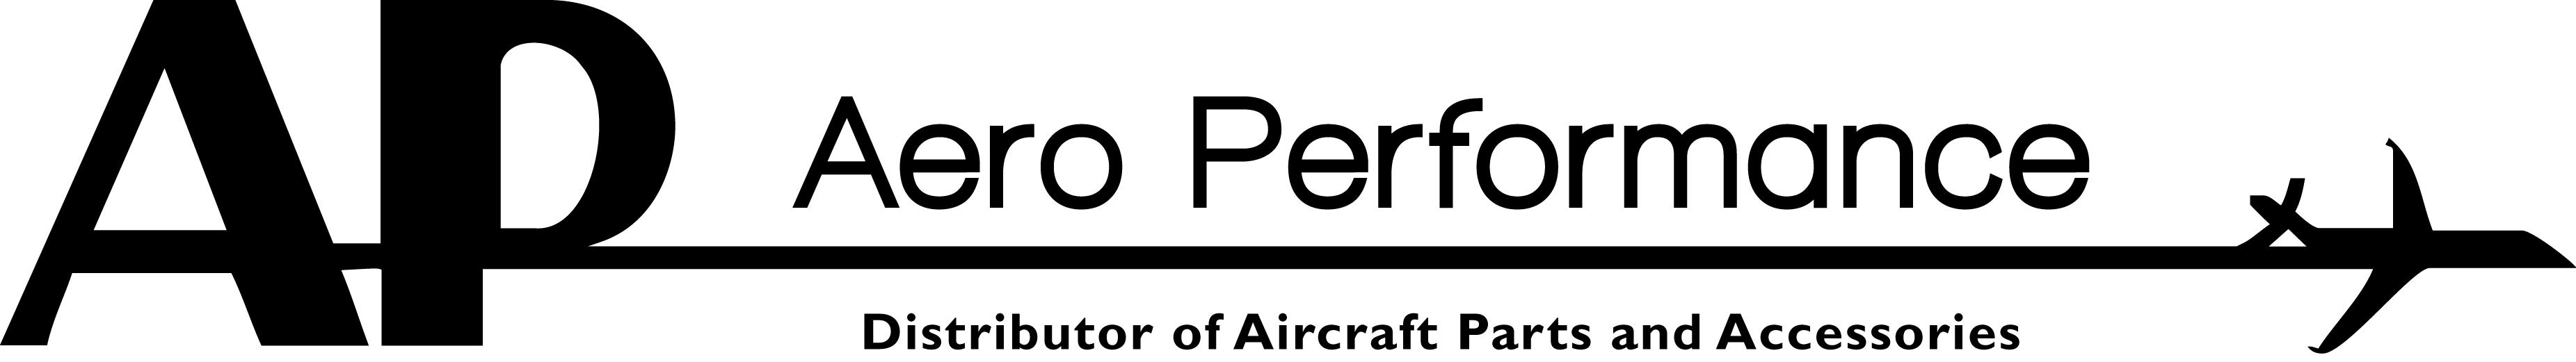 Aero Performance Logo